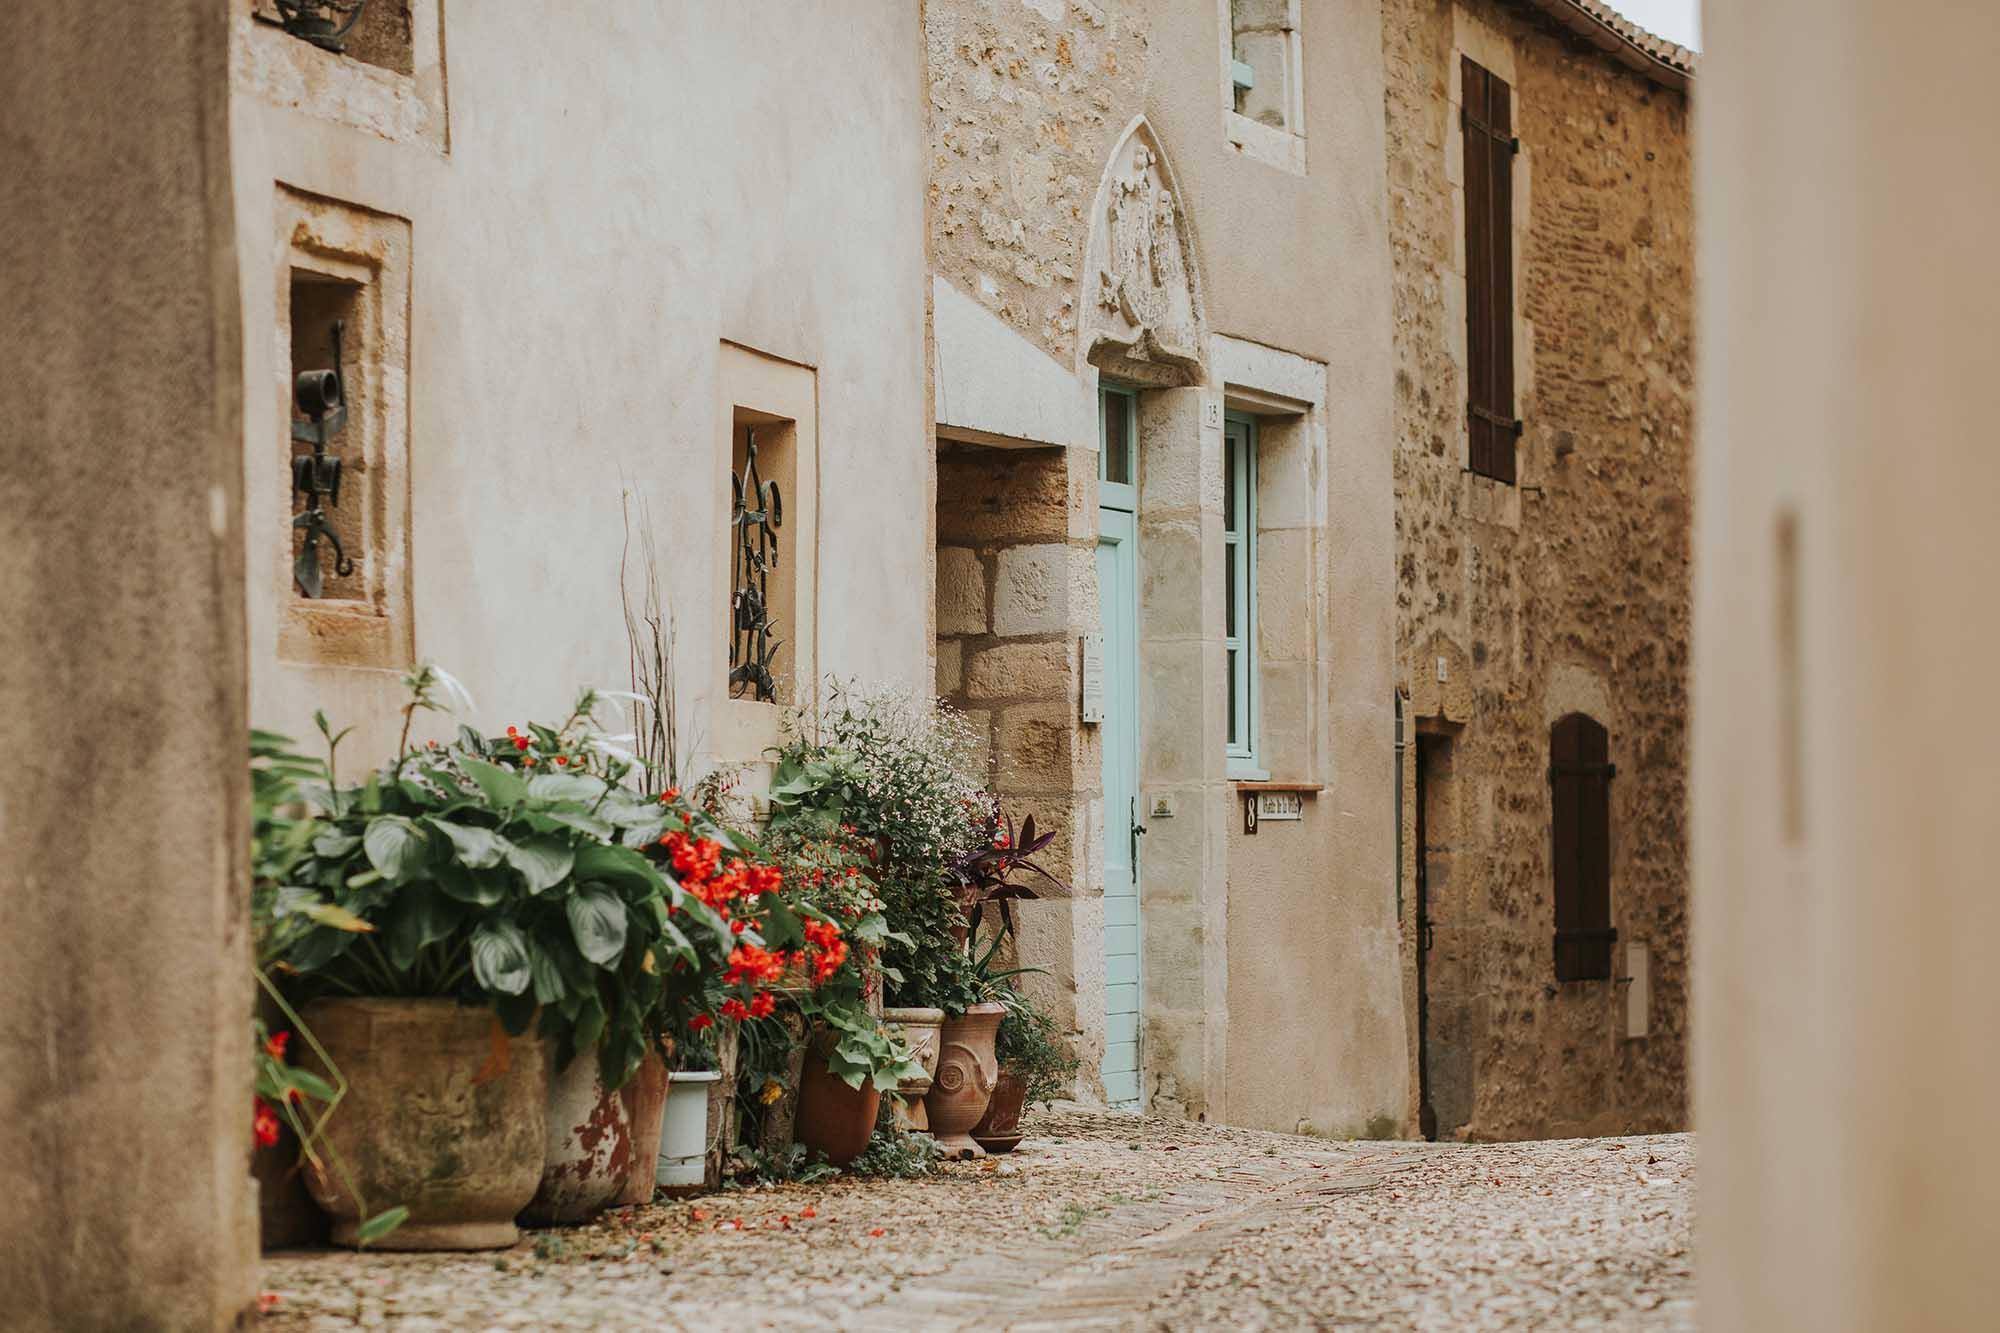 Puy L'Eveque (25).jpg